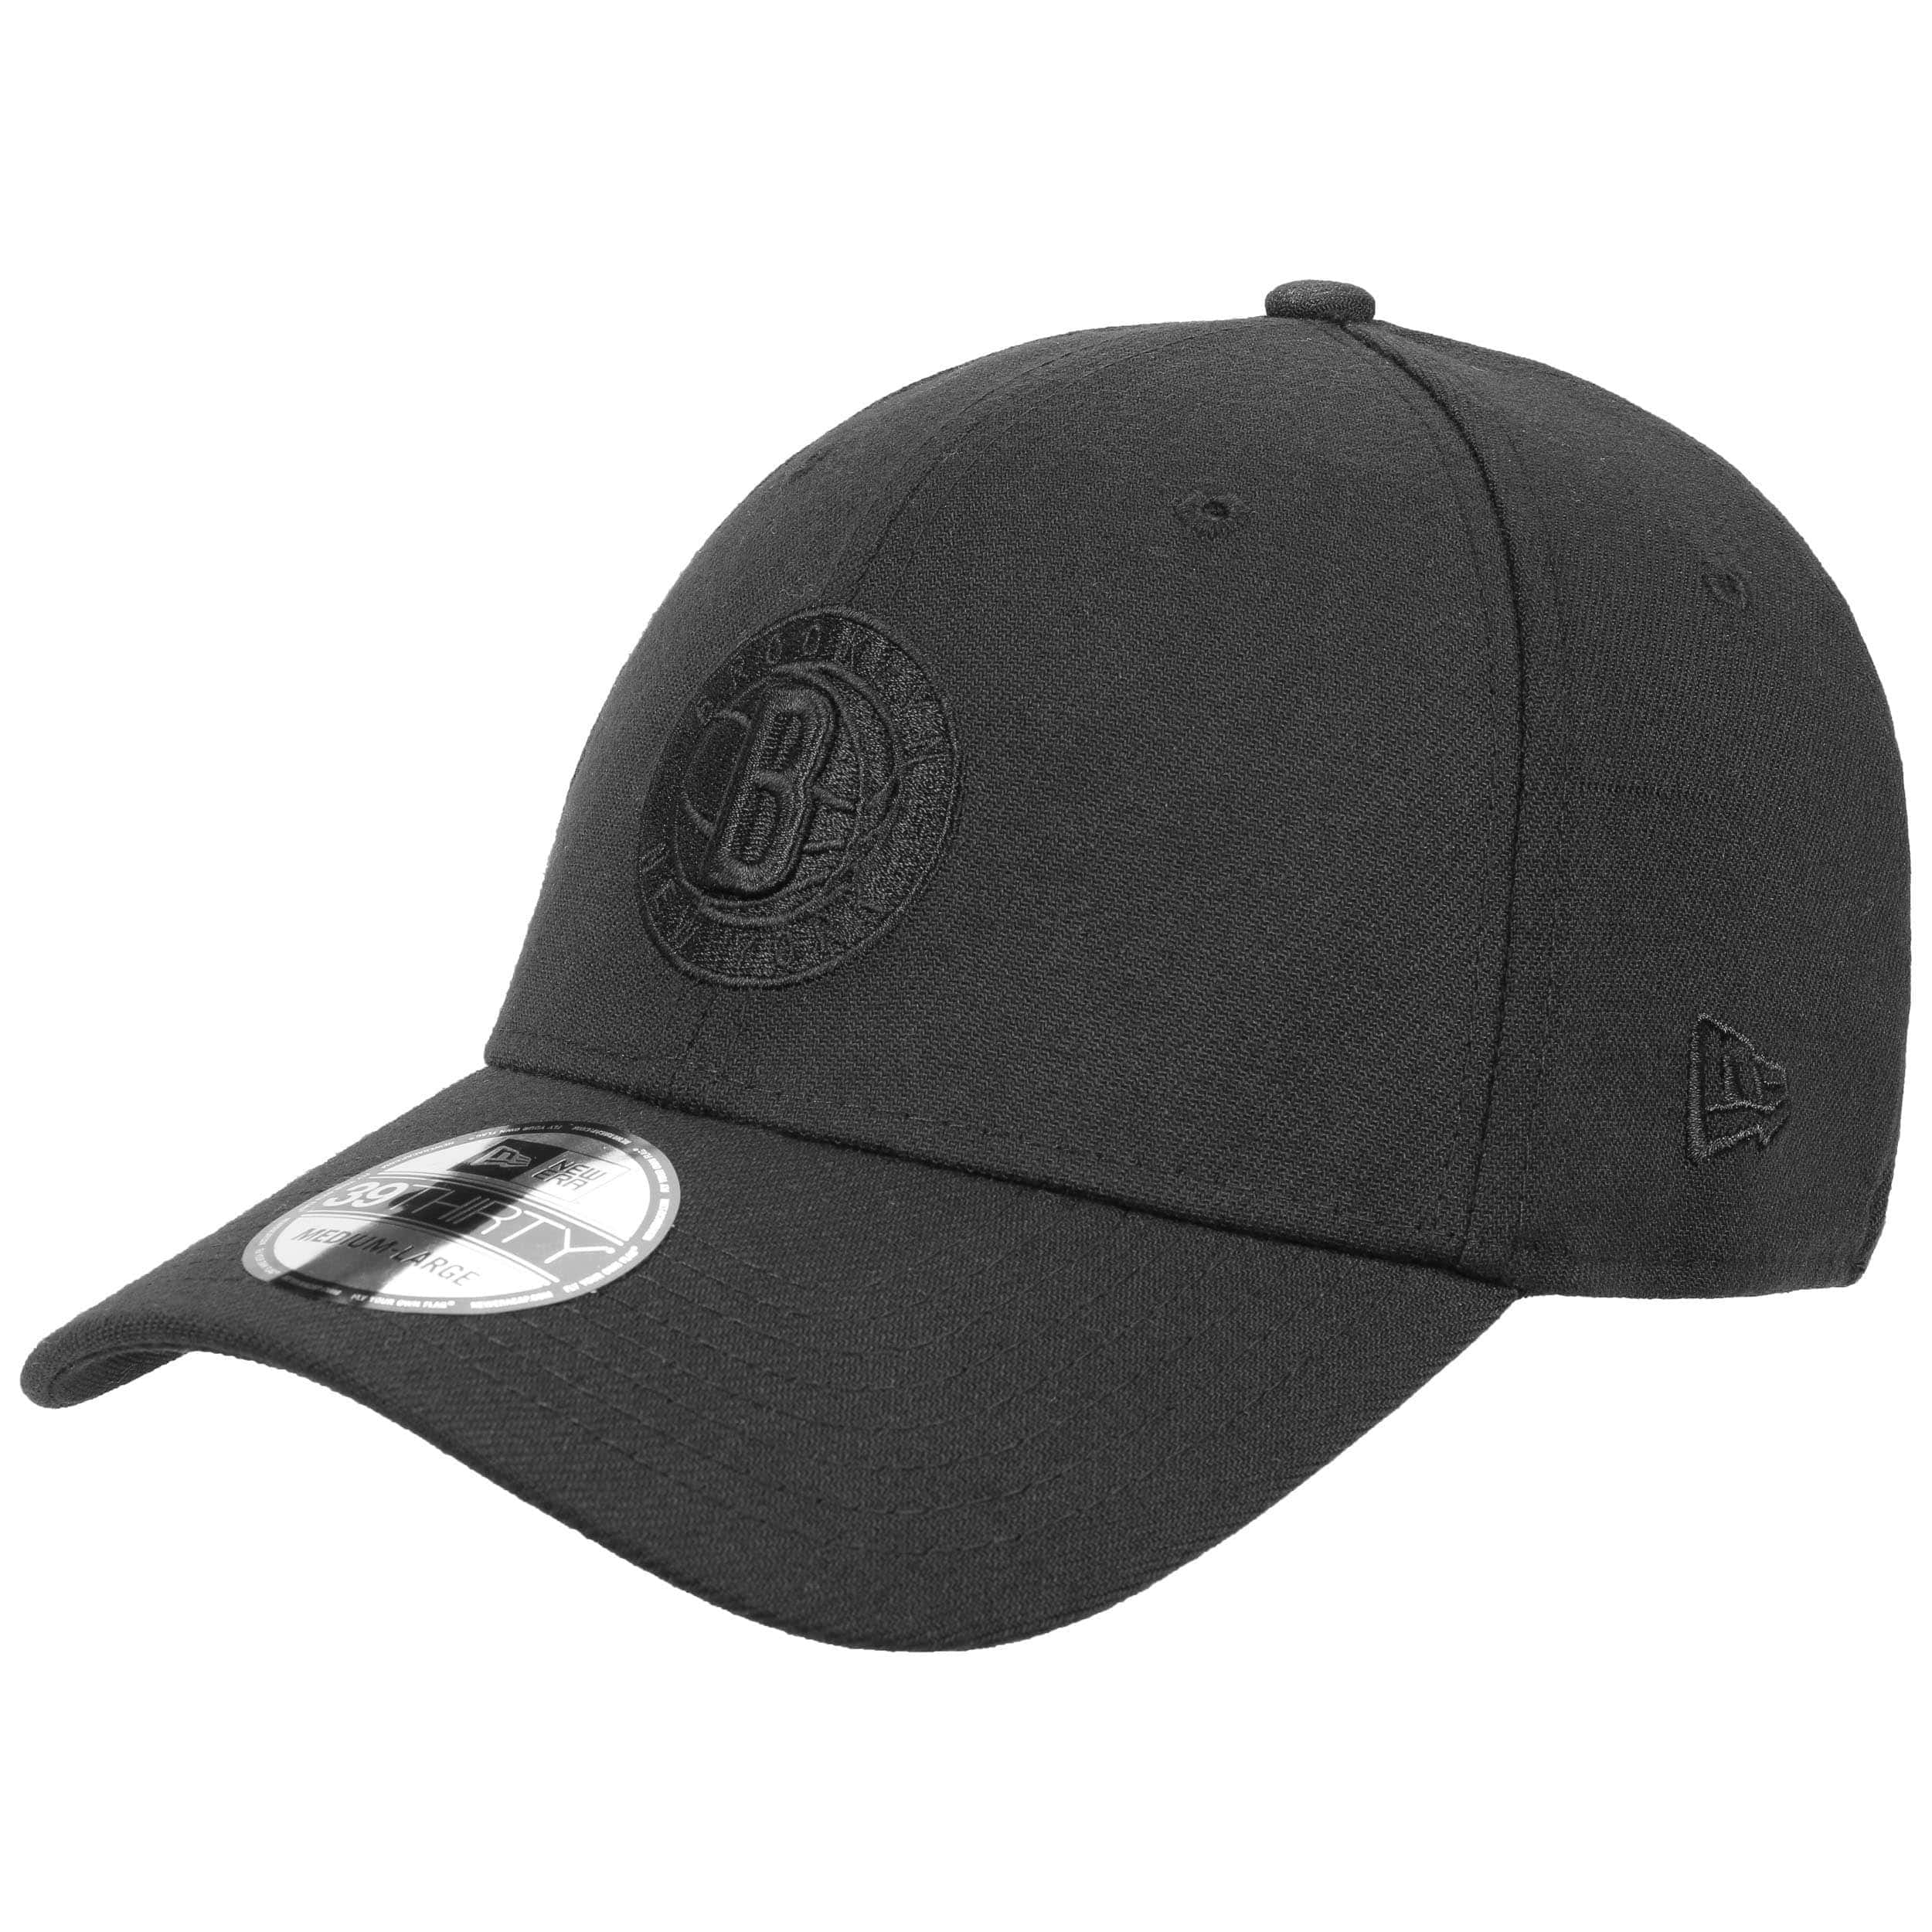 39thirty bob brooklyn nets cap by new era eur 24 95 hats caps beanies shop online. Black Bedroom Furniture Sets. Home Design Ideas